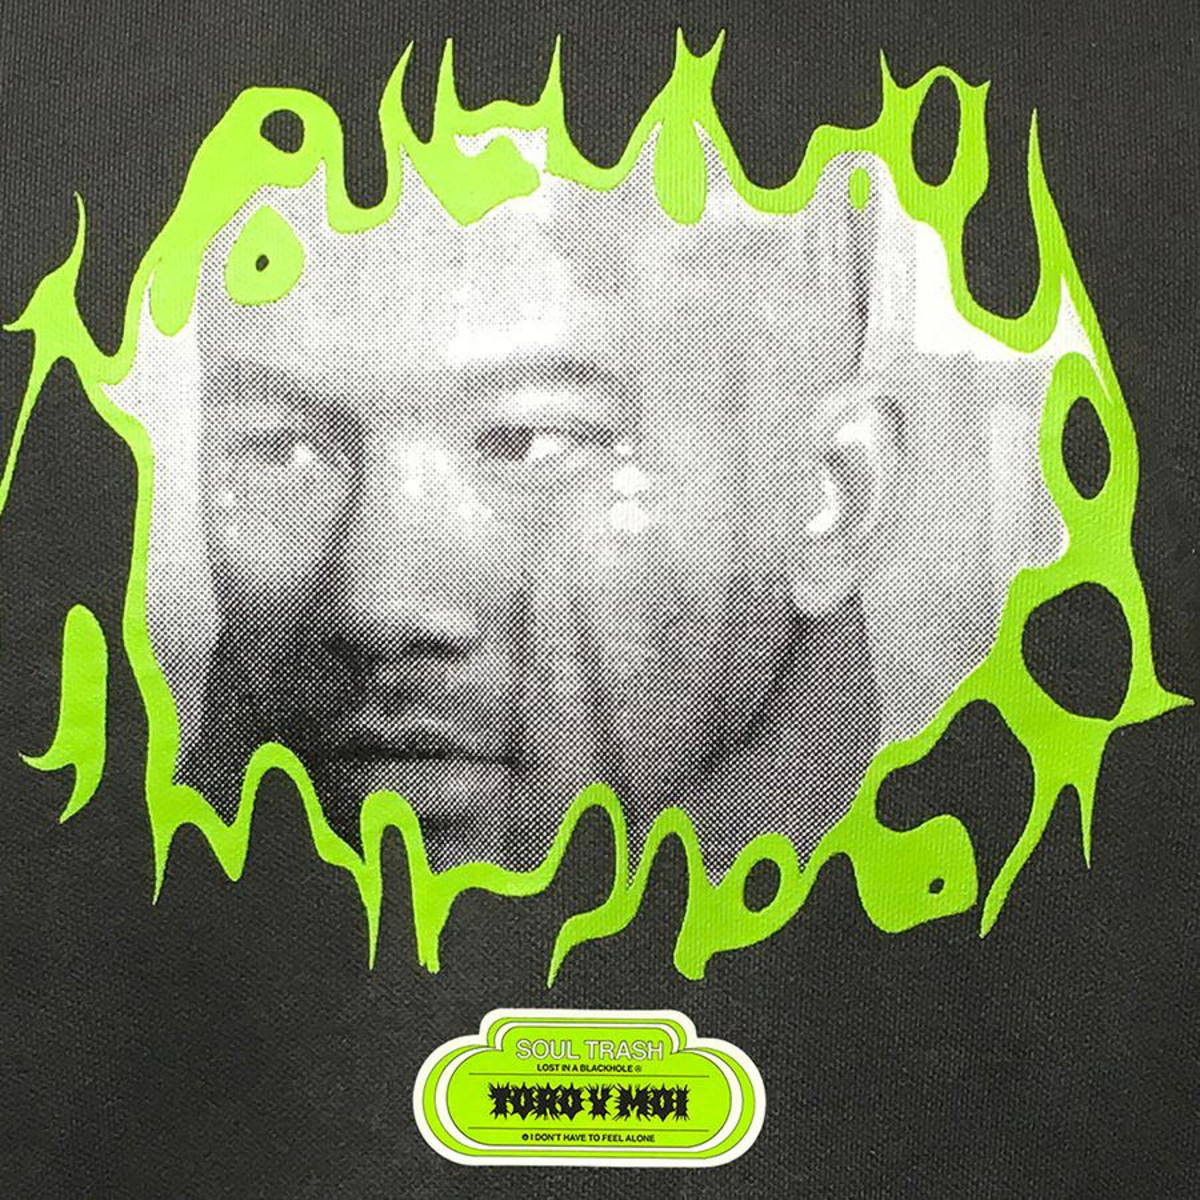 Toro Y Moi Soul Trash mixtape